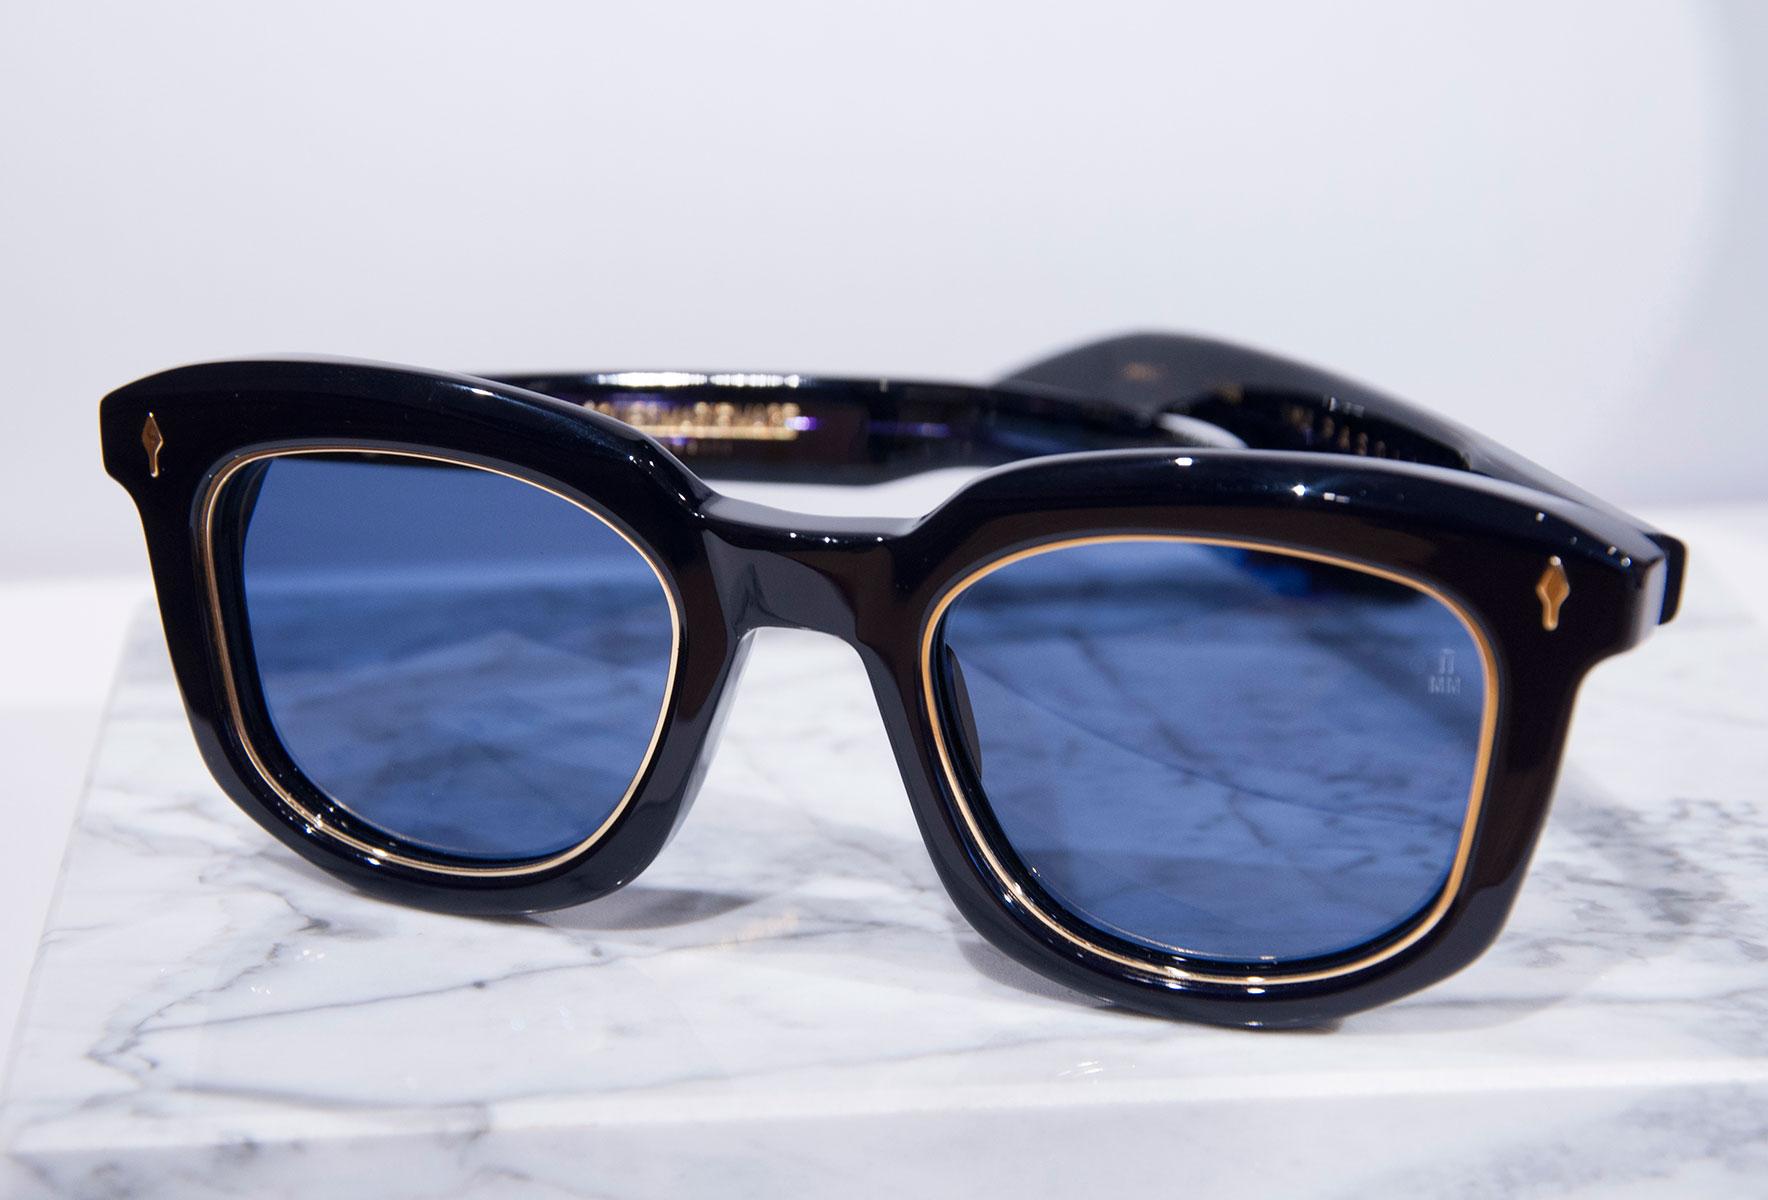 Pasolini sunglasses